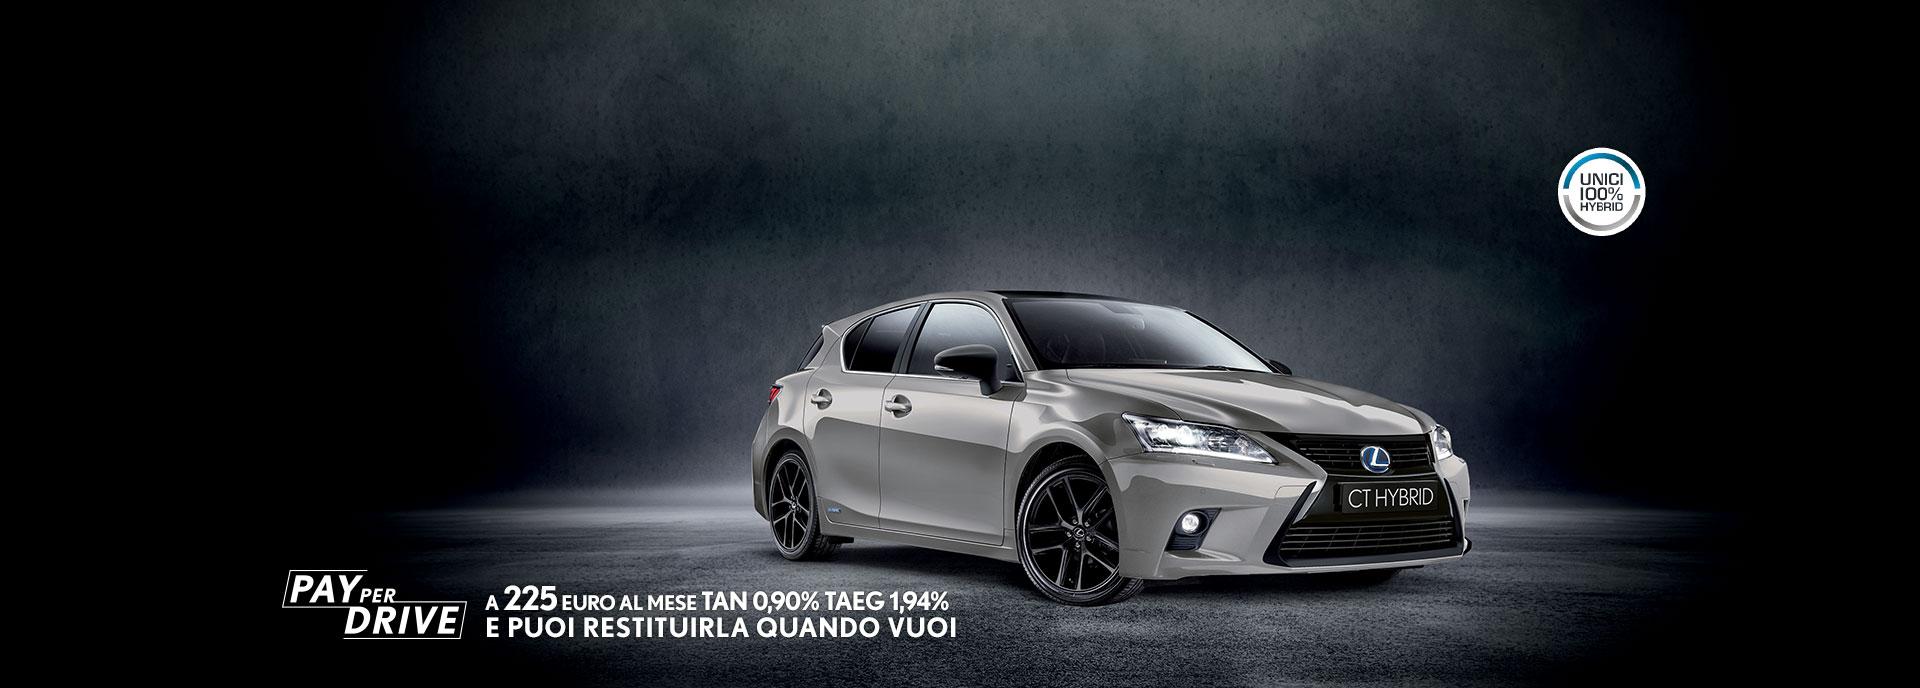 CT Hybrid Black Street colore sonic titanium offerta Pay per Drive